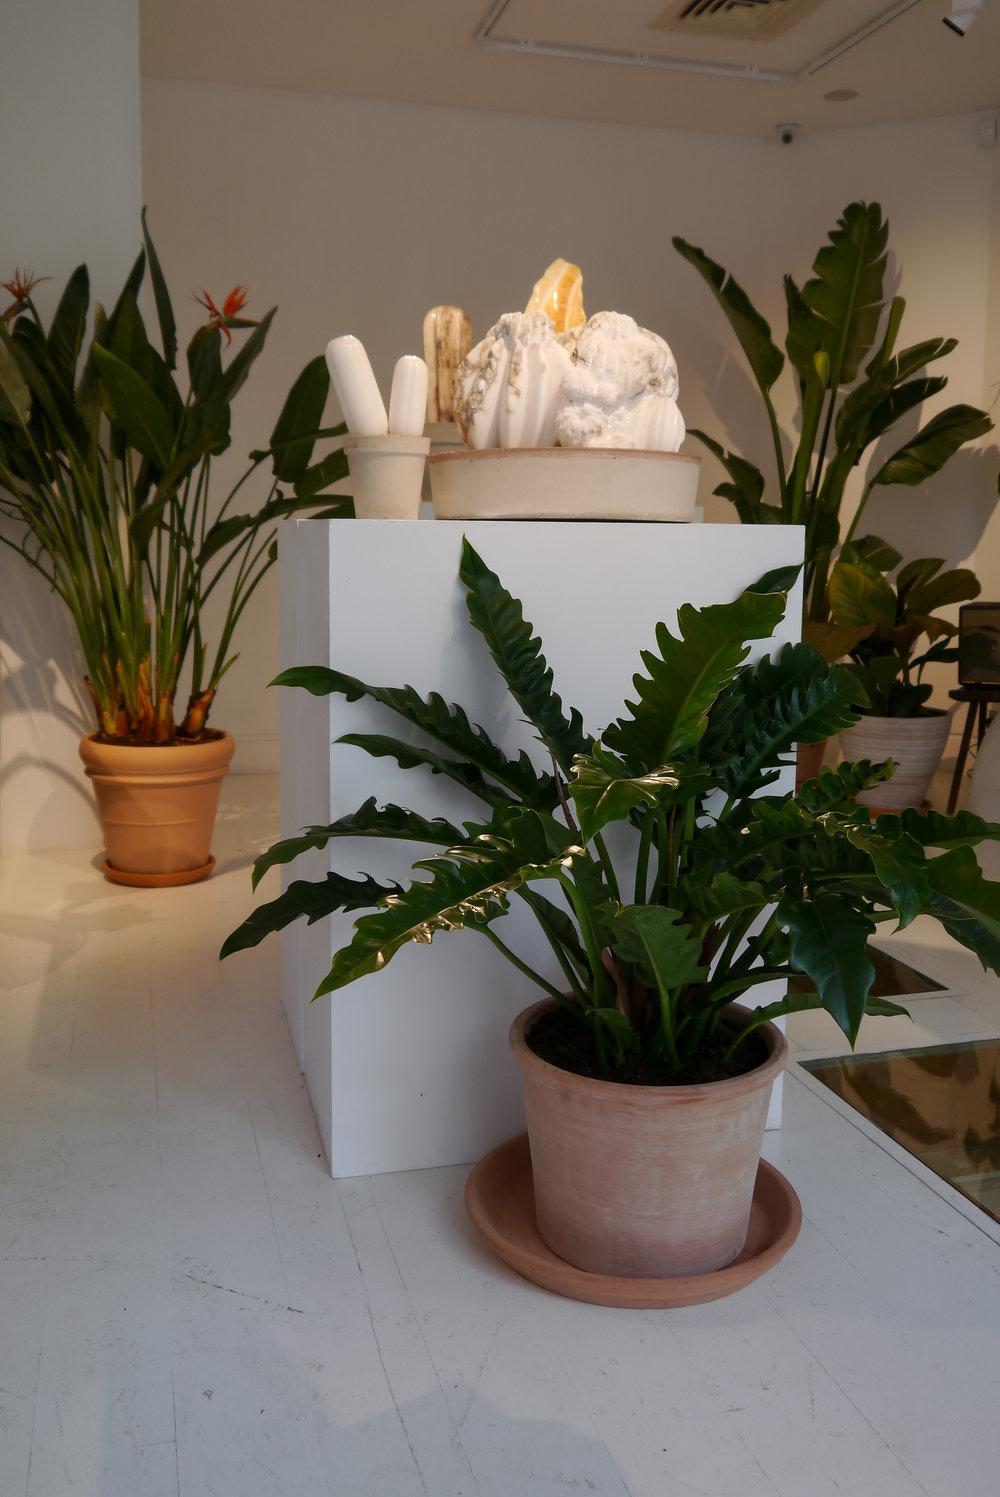 Conservatory-40.jpg